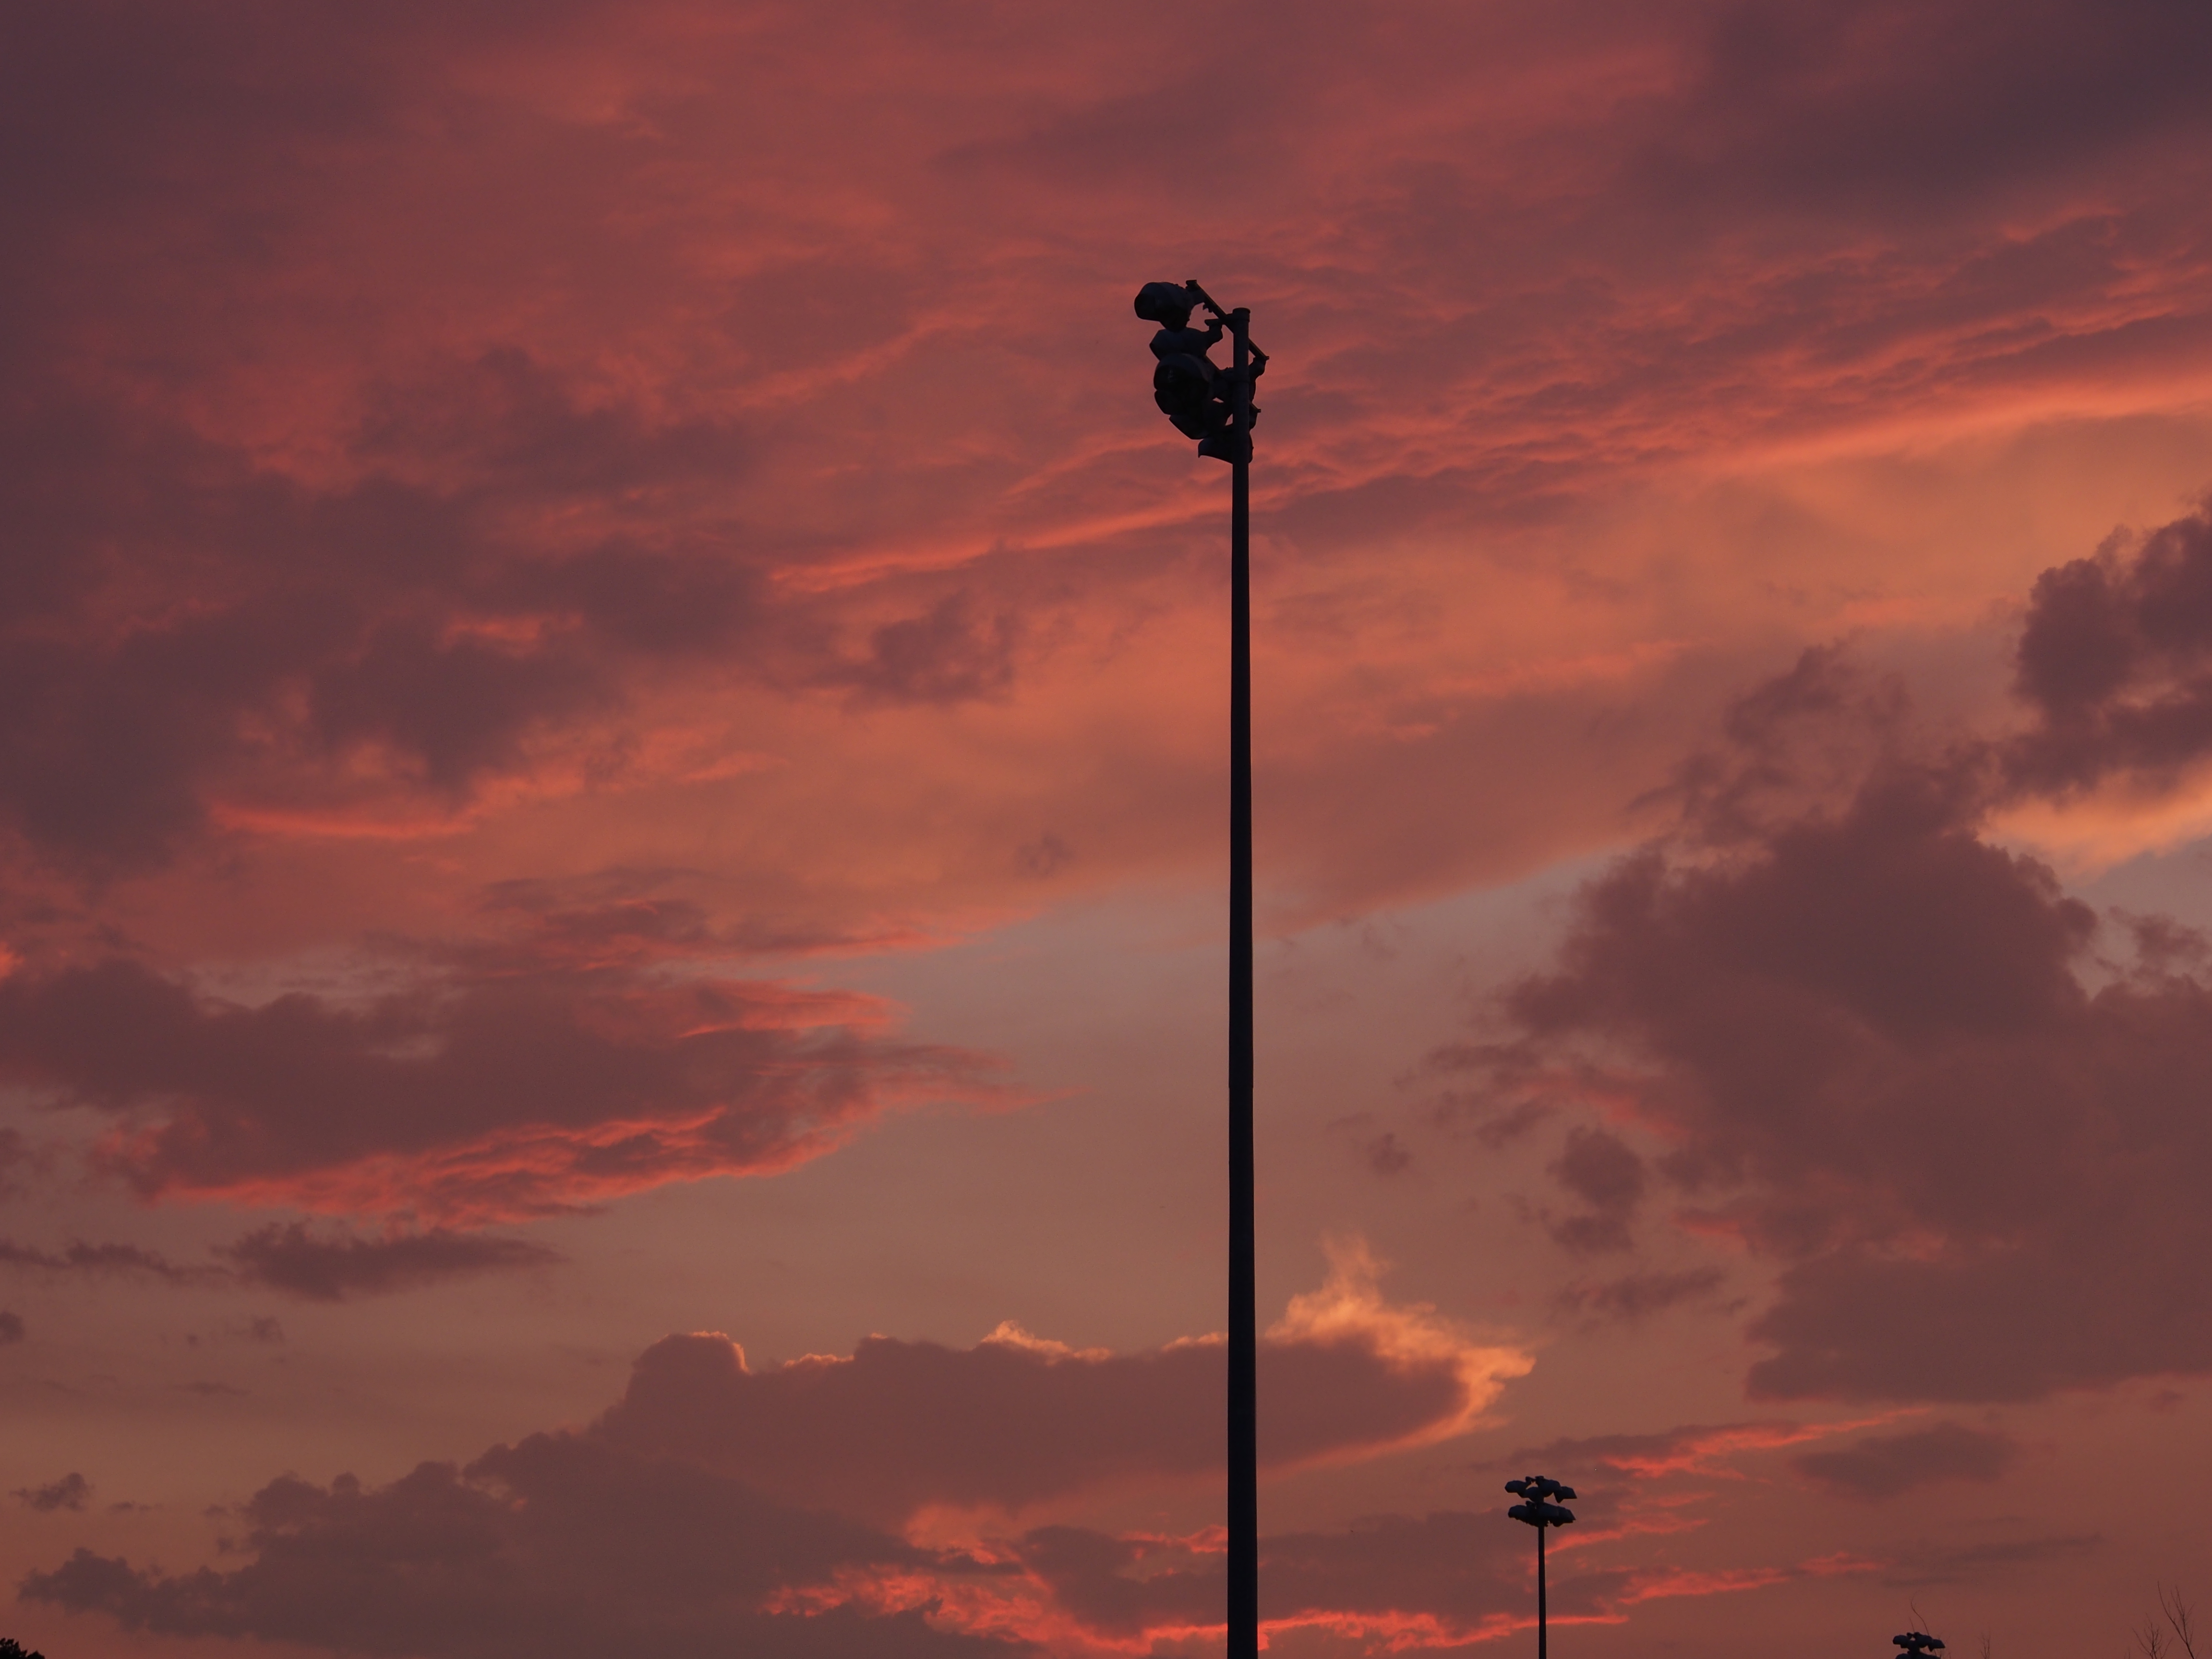 Lights at a soccer field